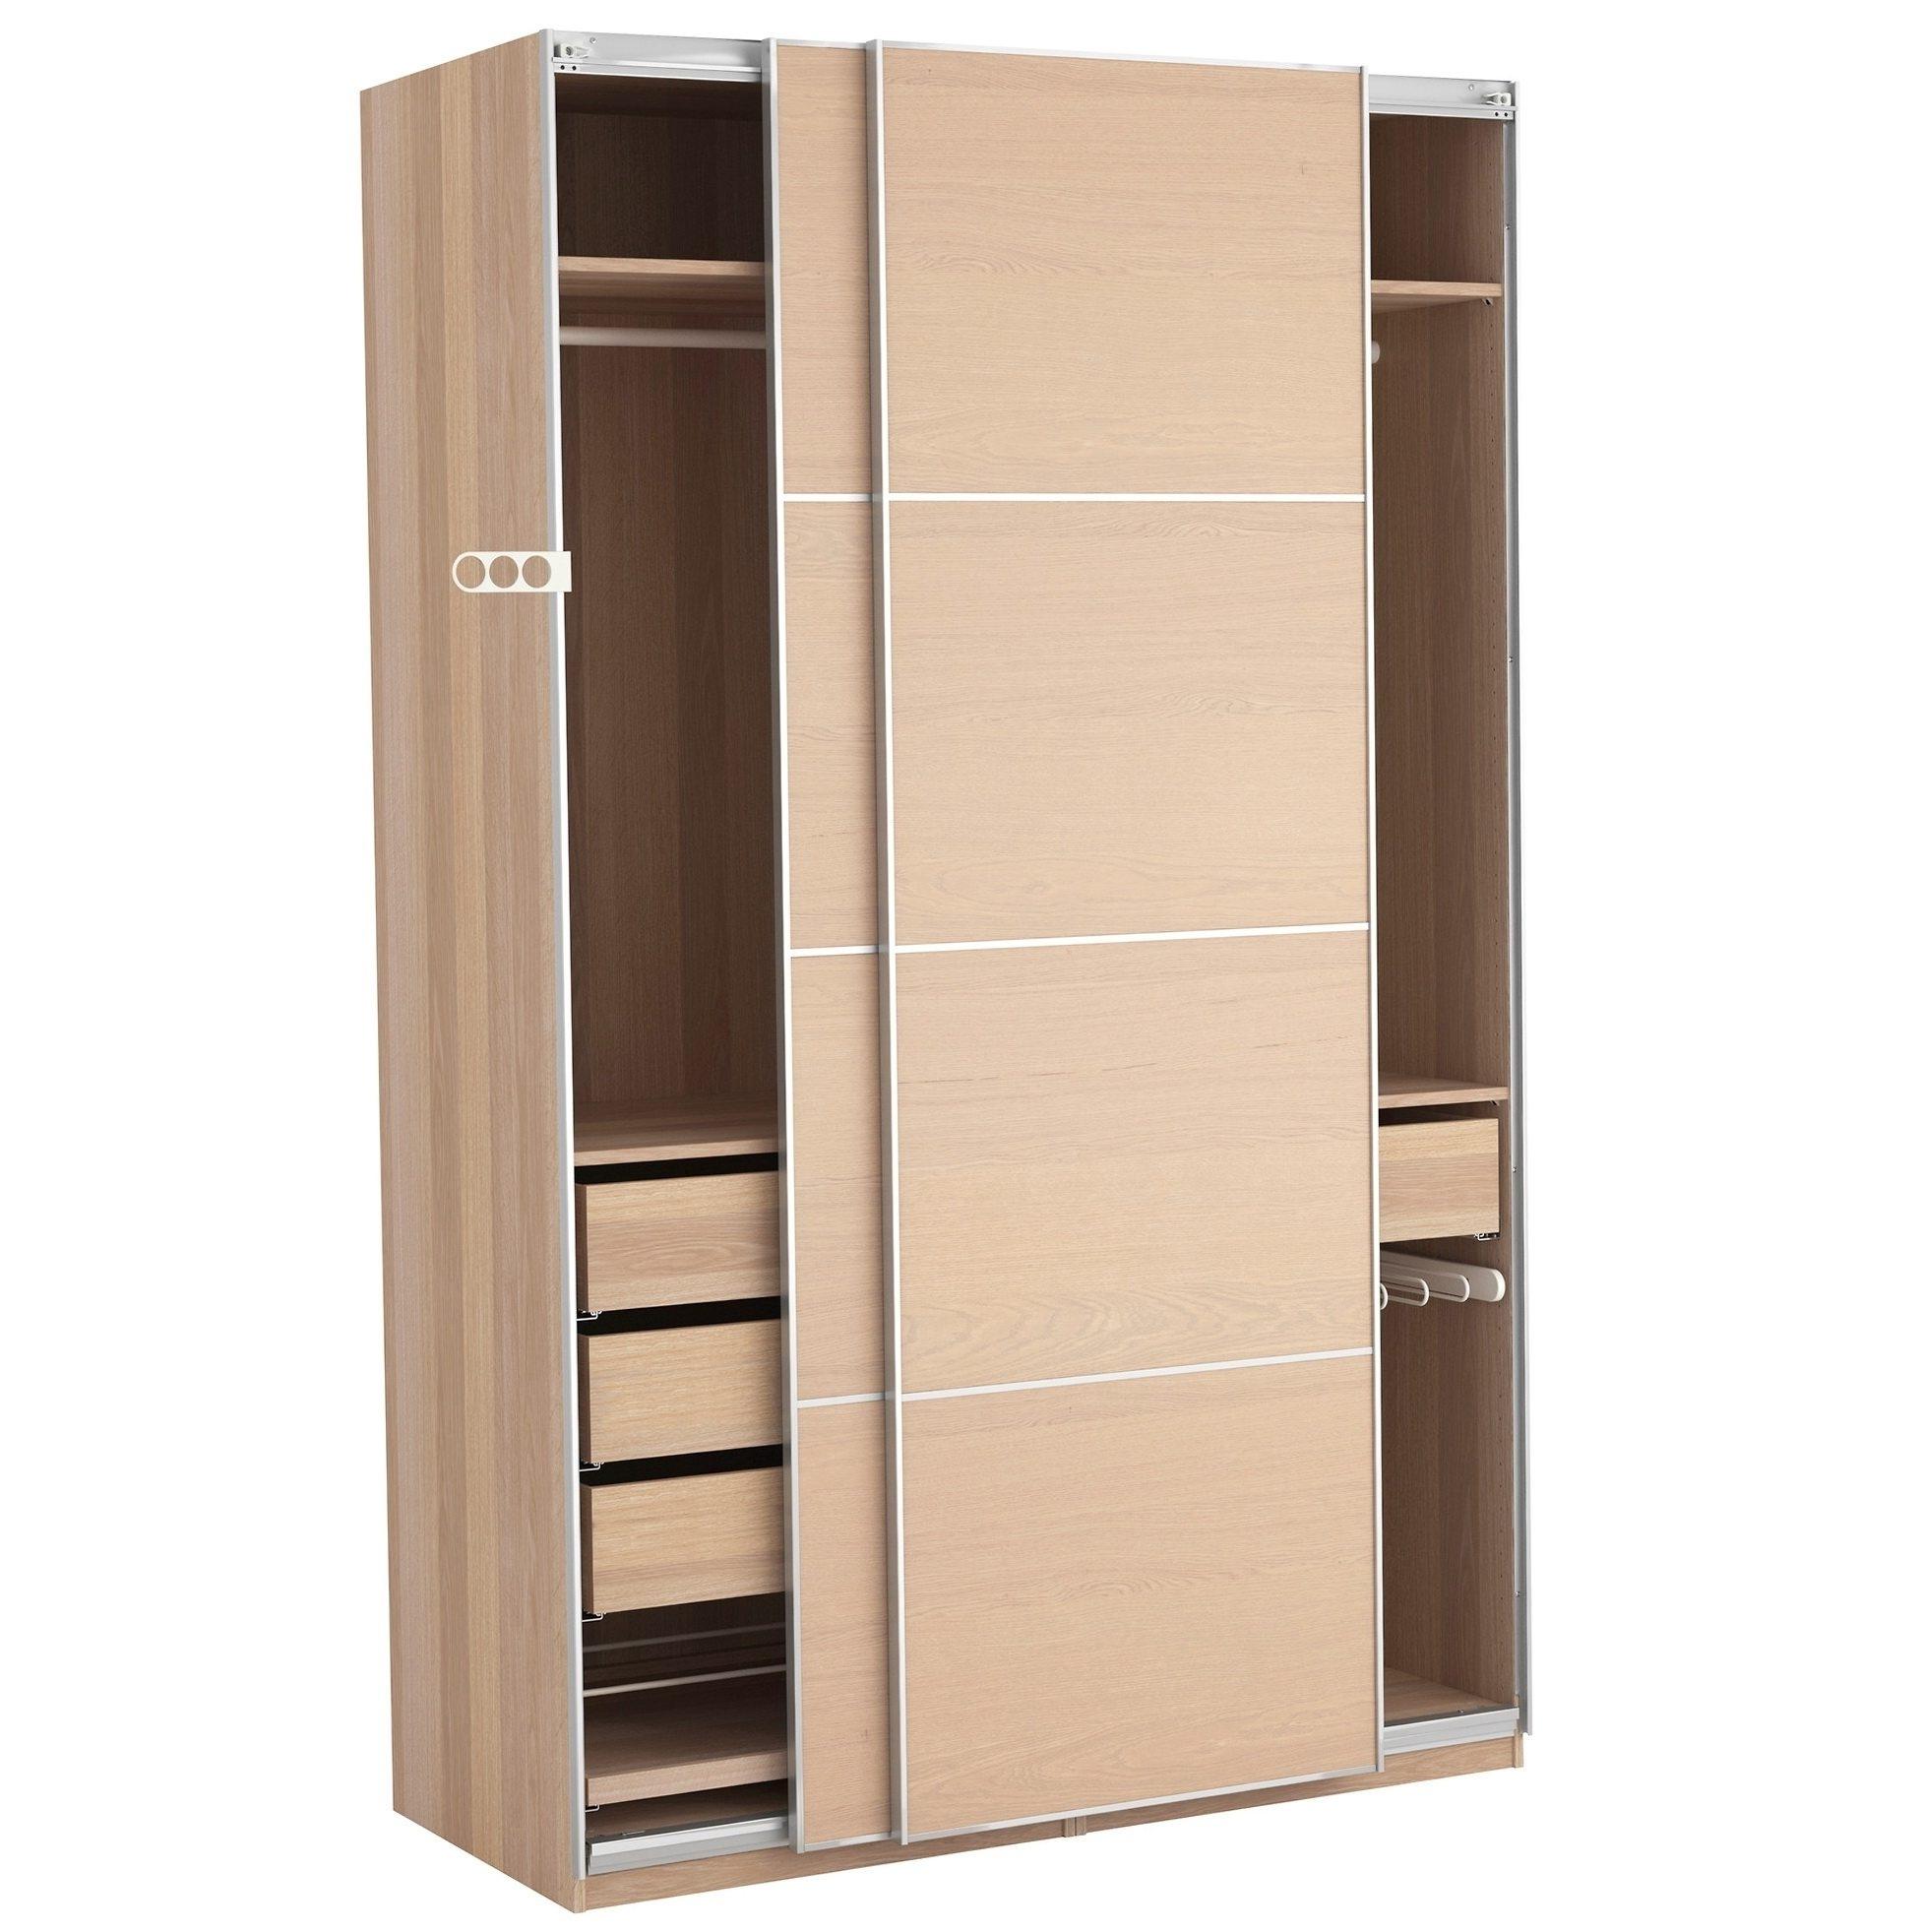 Portable Closet System, Portable Closet Storage Villaran Rodrigo Within On The Go With A Portable Wardrobe Closet (Image 18 of 27)